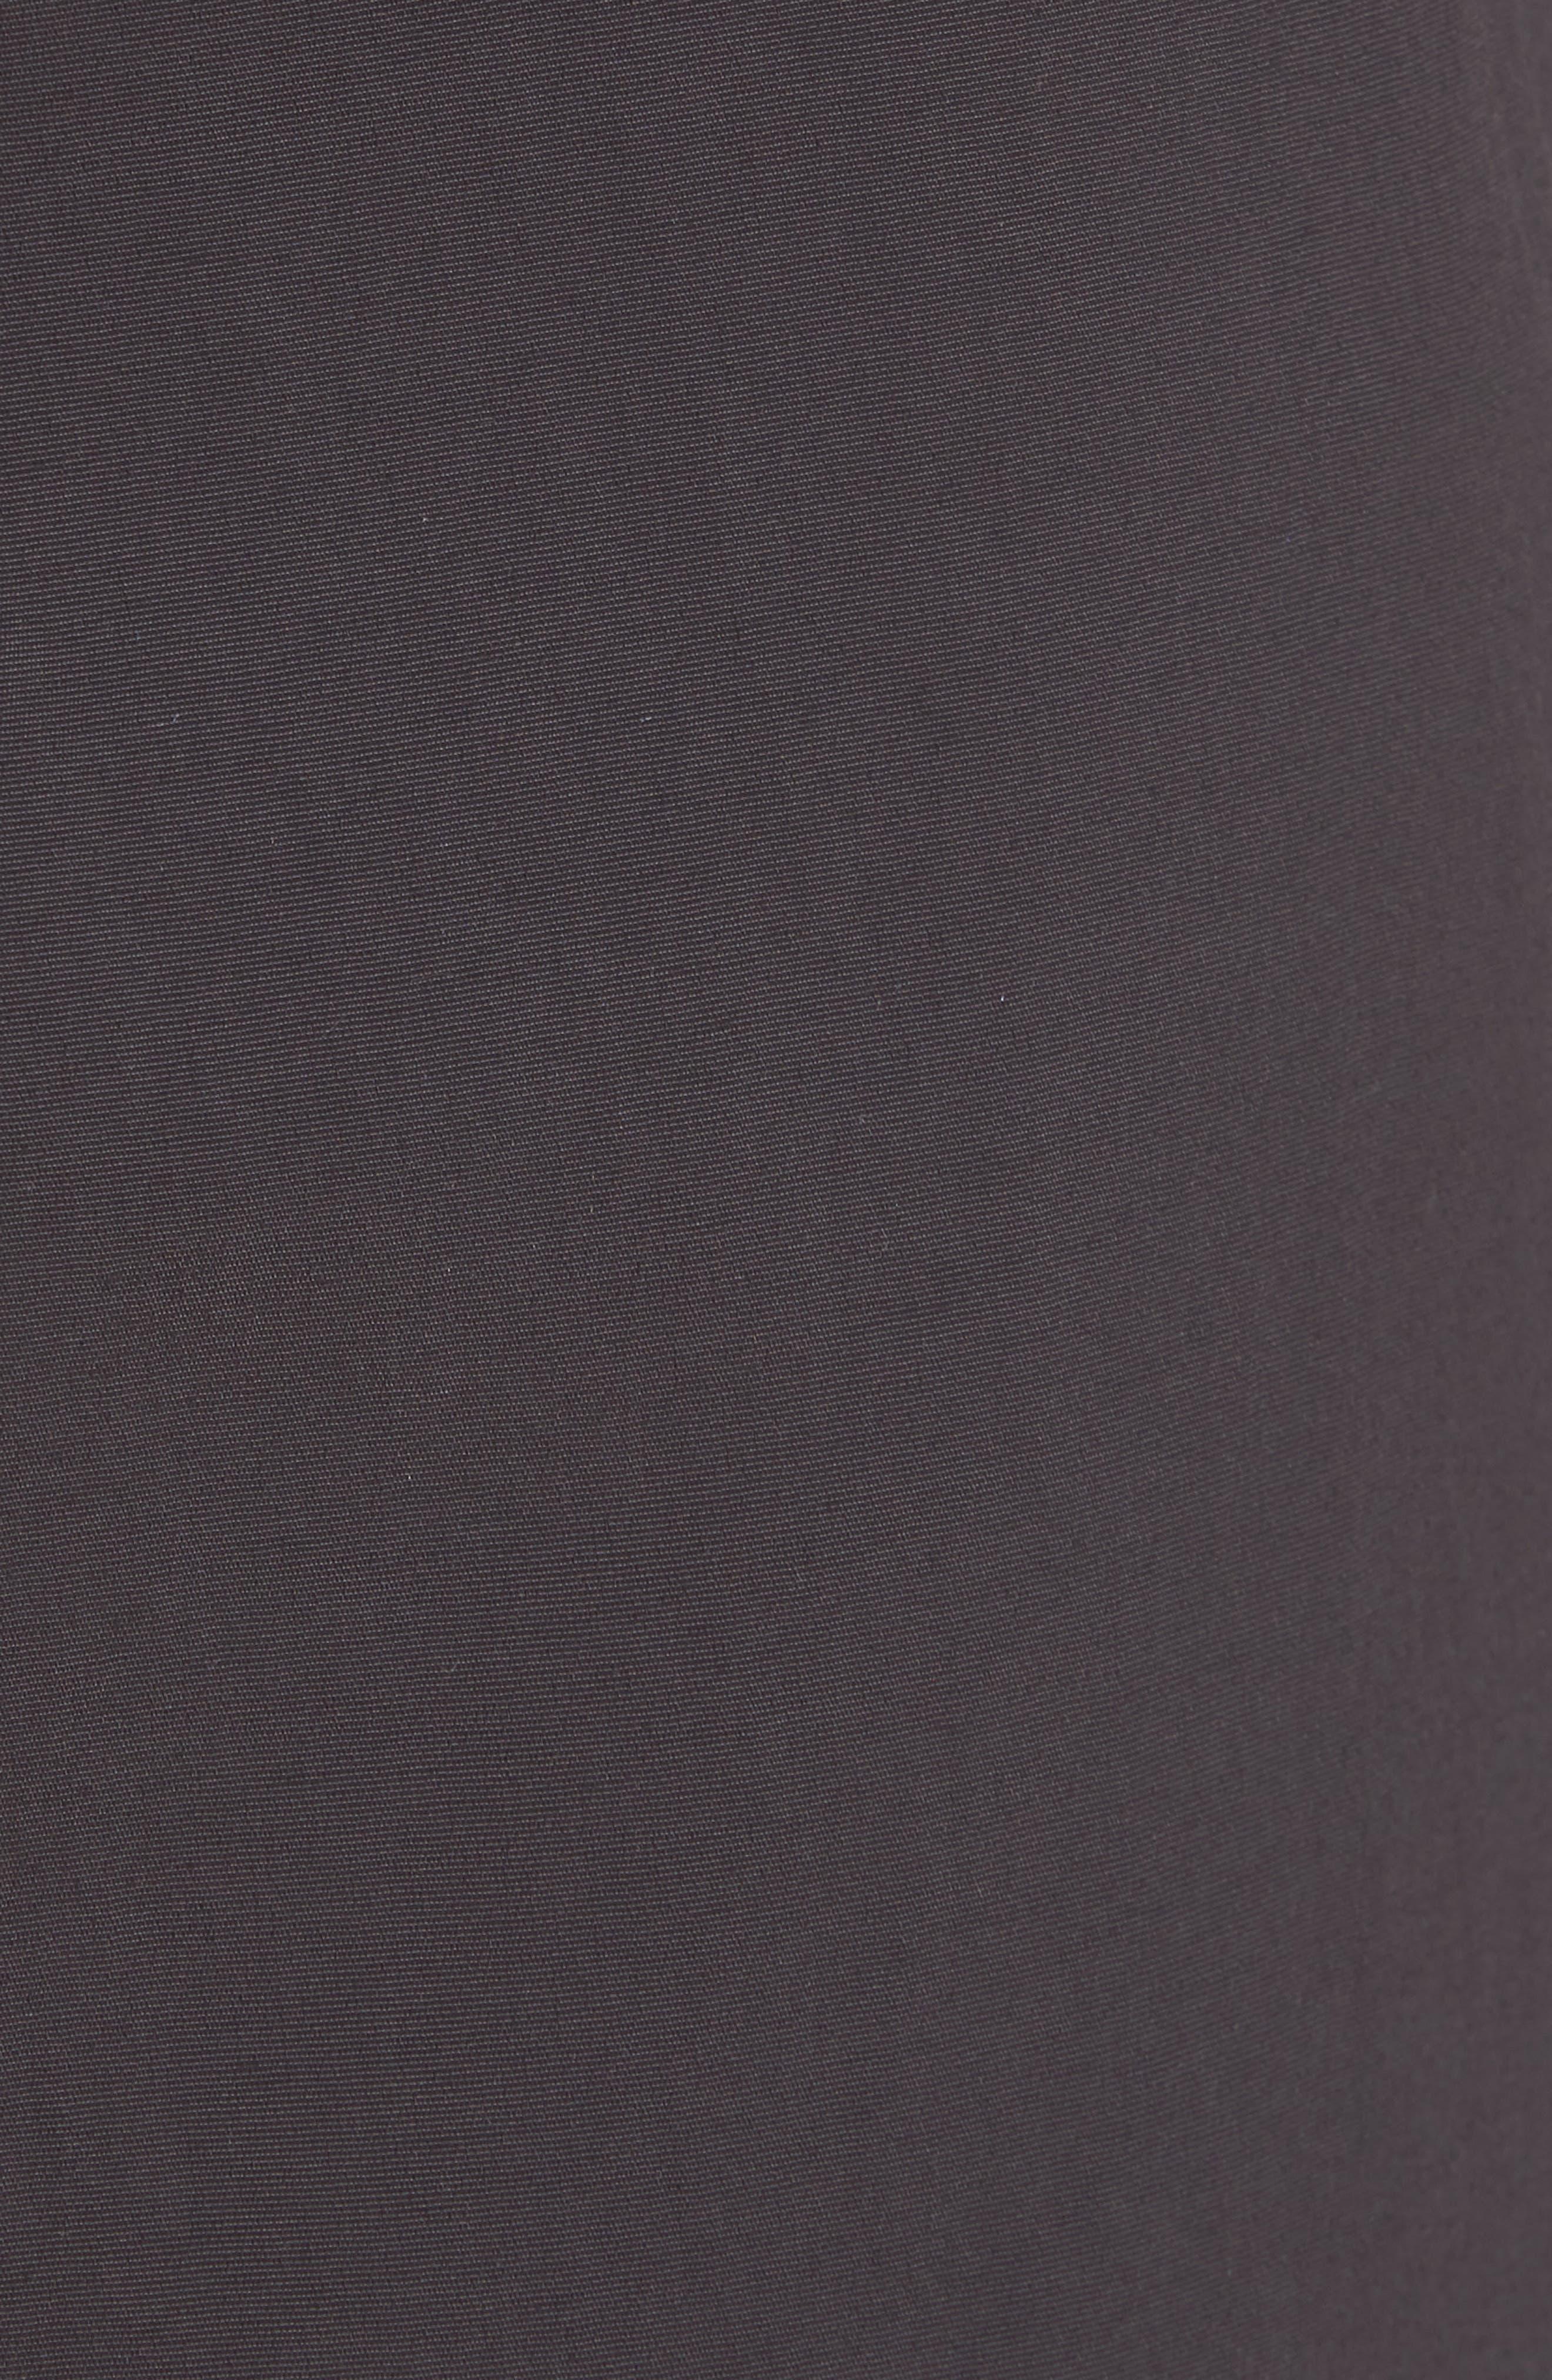 Wavefarer Board Shorts,                             Alternate thumbnail 5, color,                             001